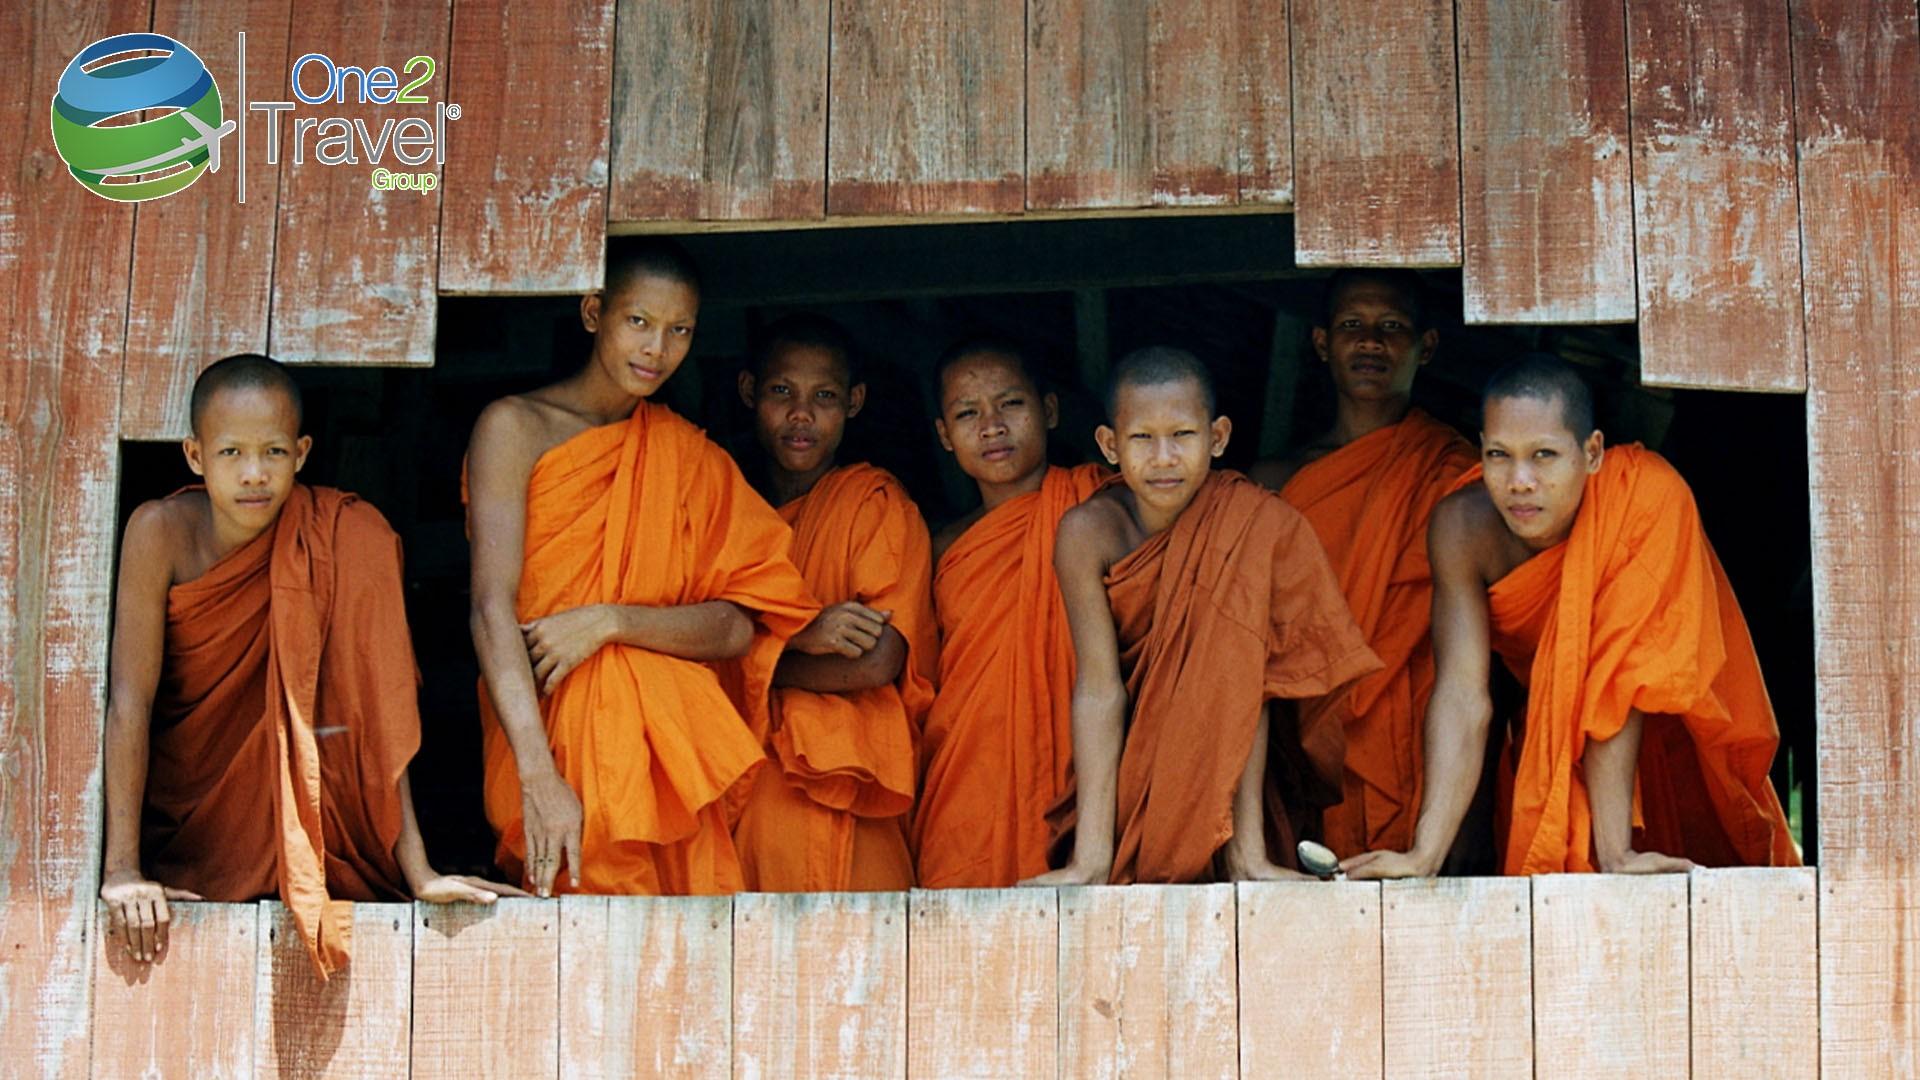 Seminario Web | One2Travel | Actividades al Aire Libre en Asia